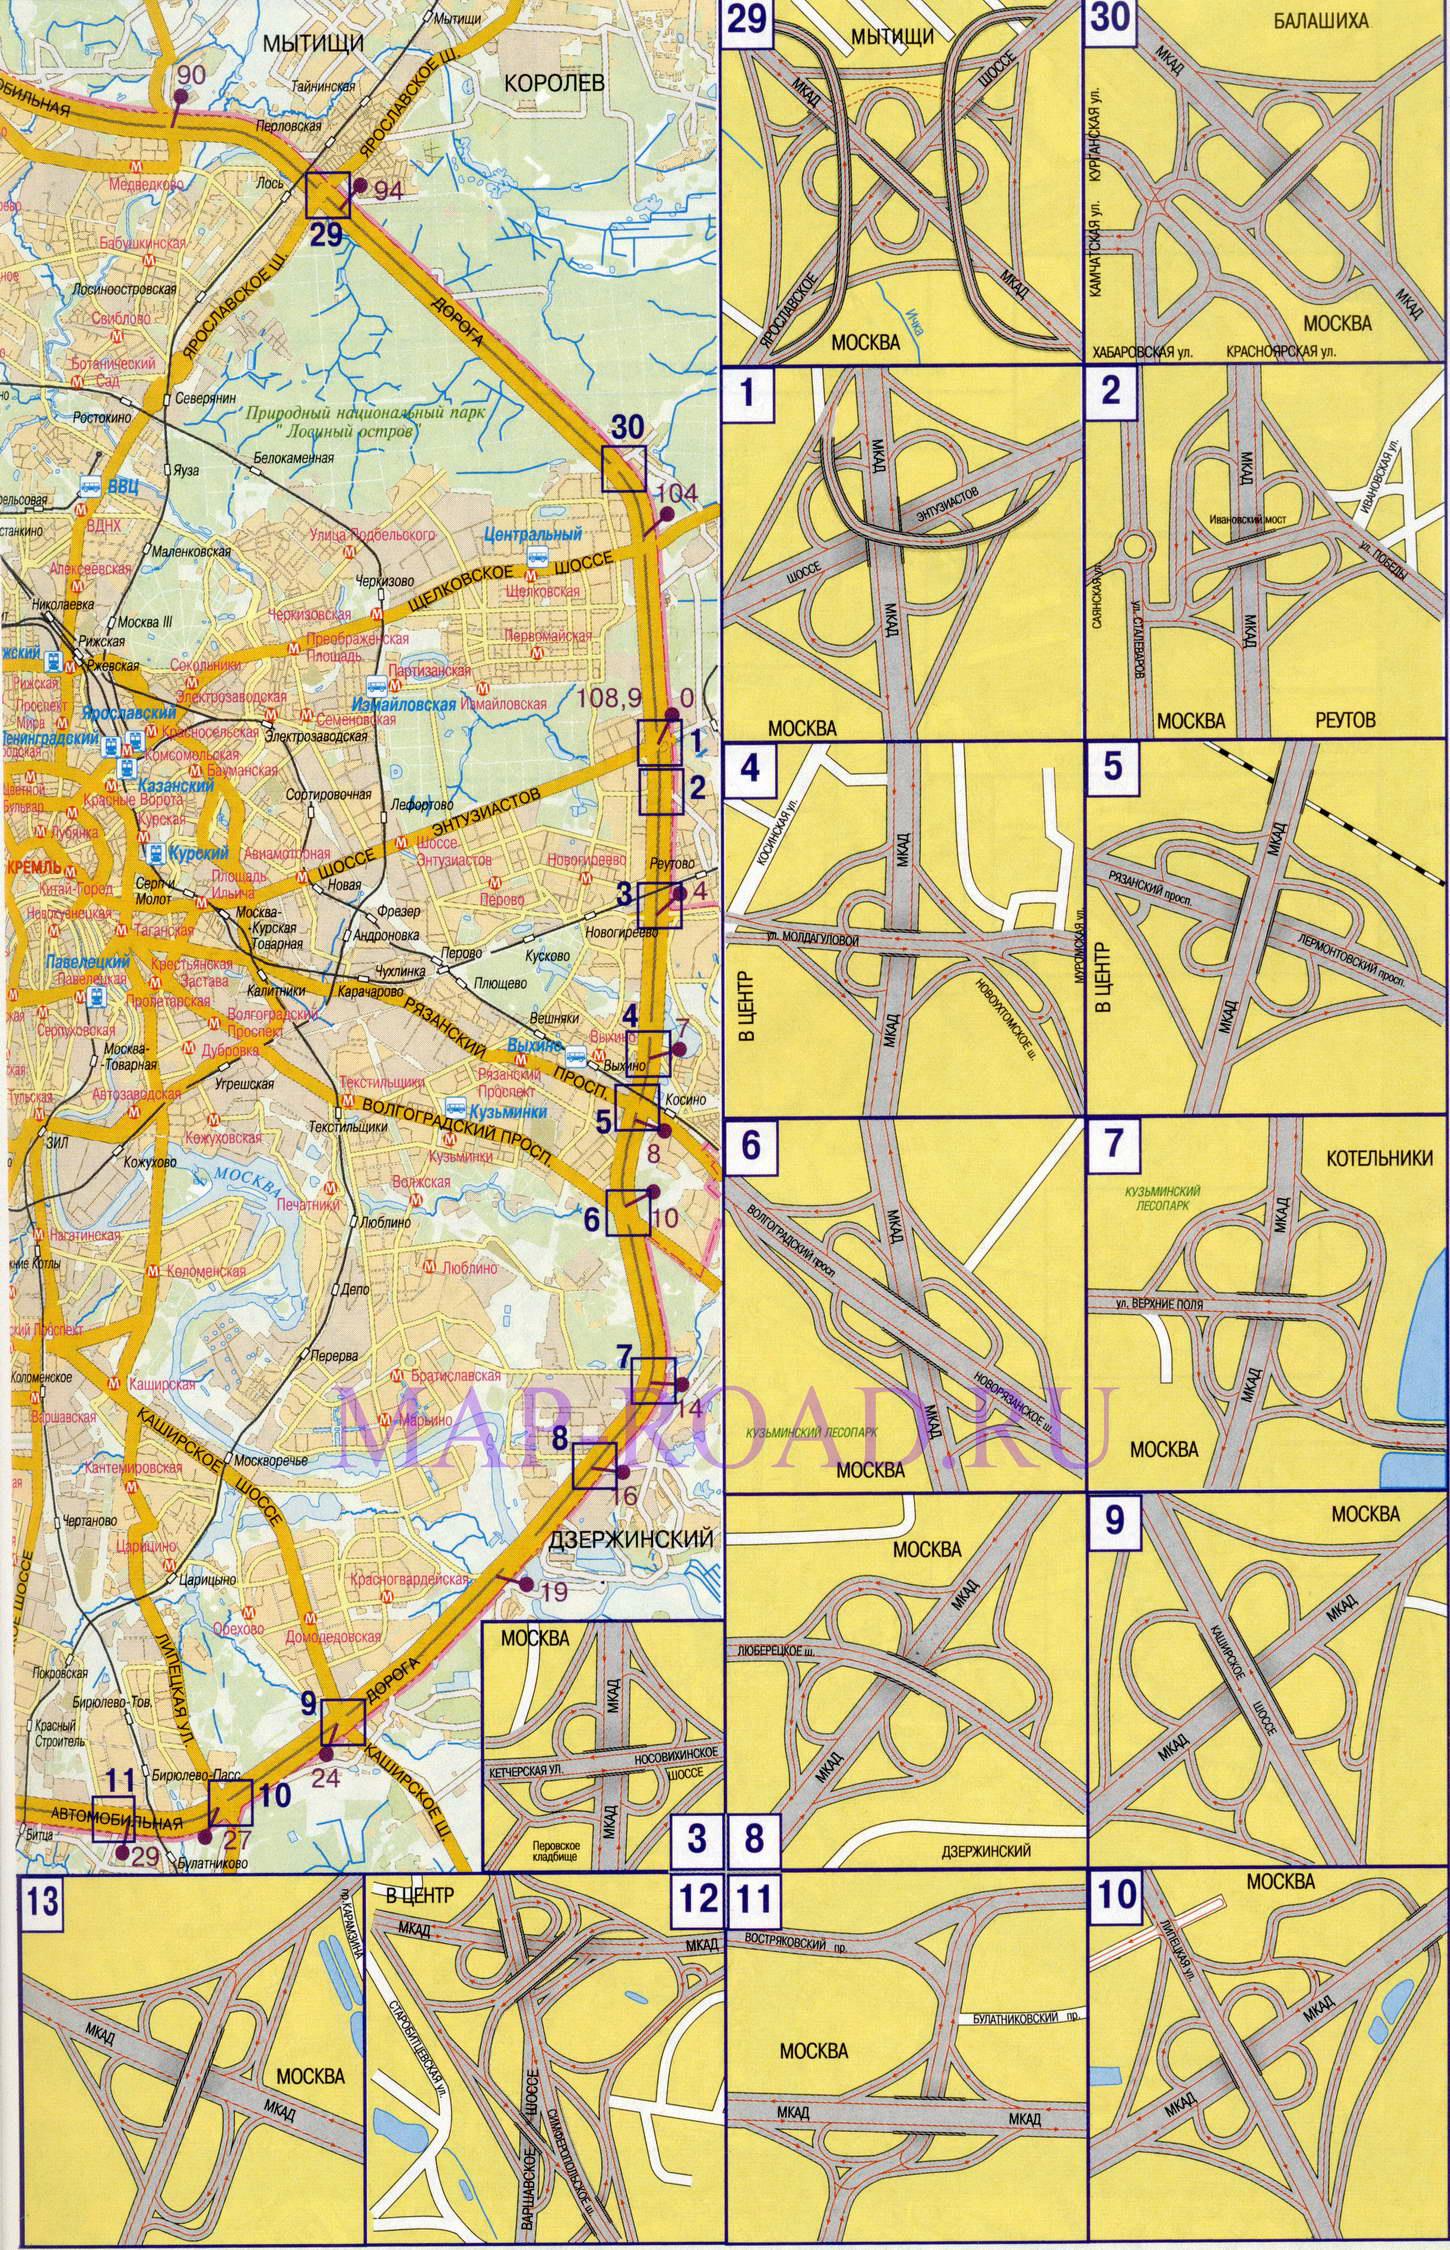 Карта схема Москвы с развязками на МКАД.